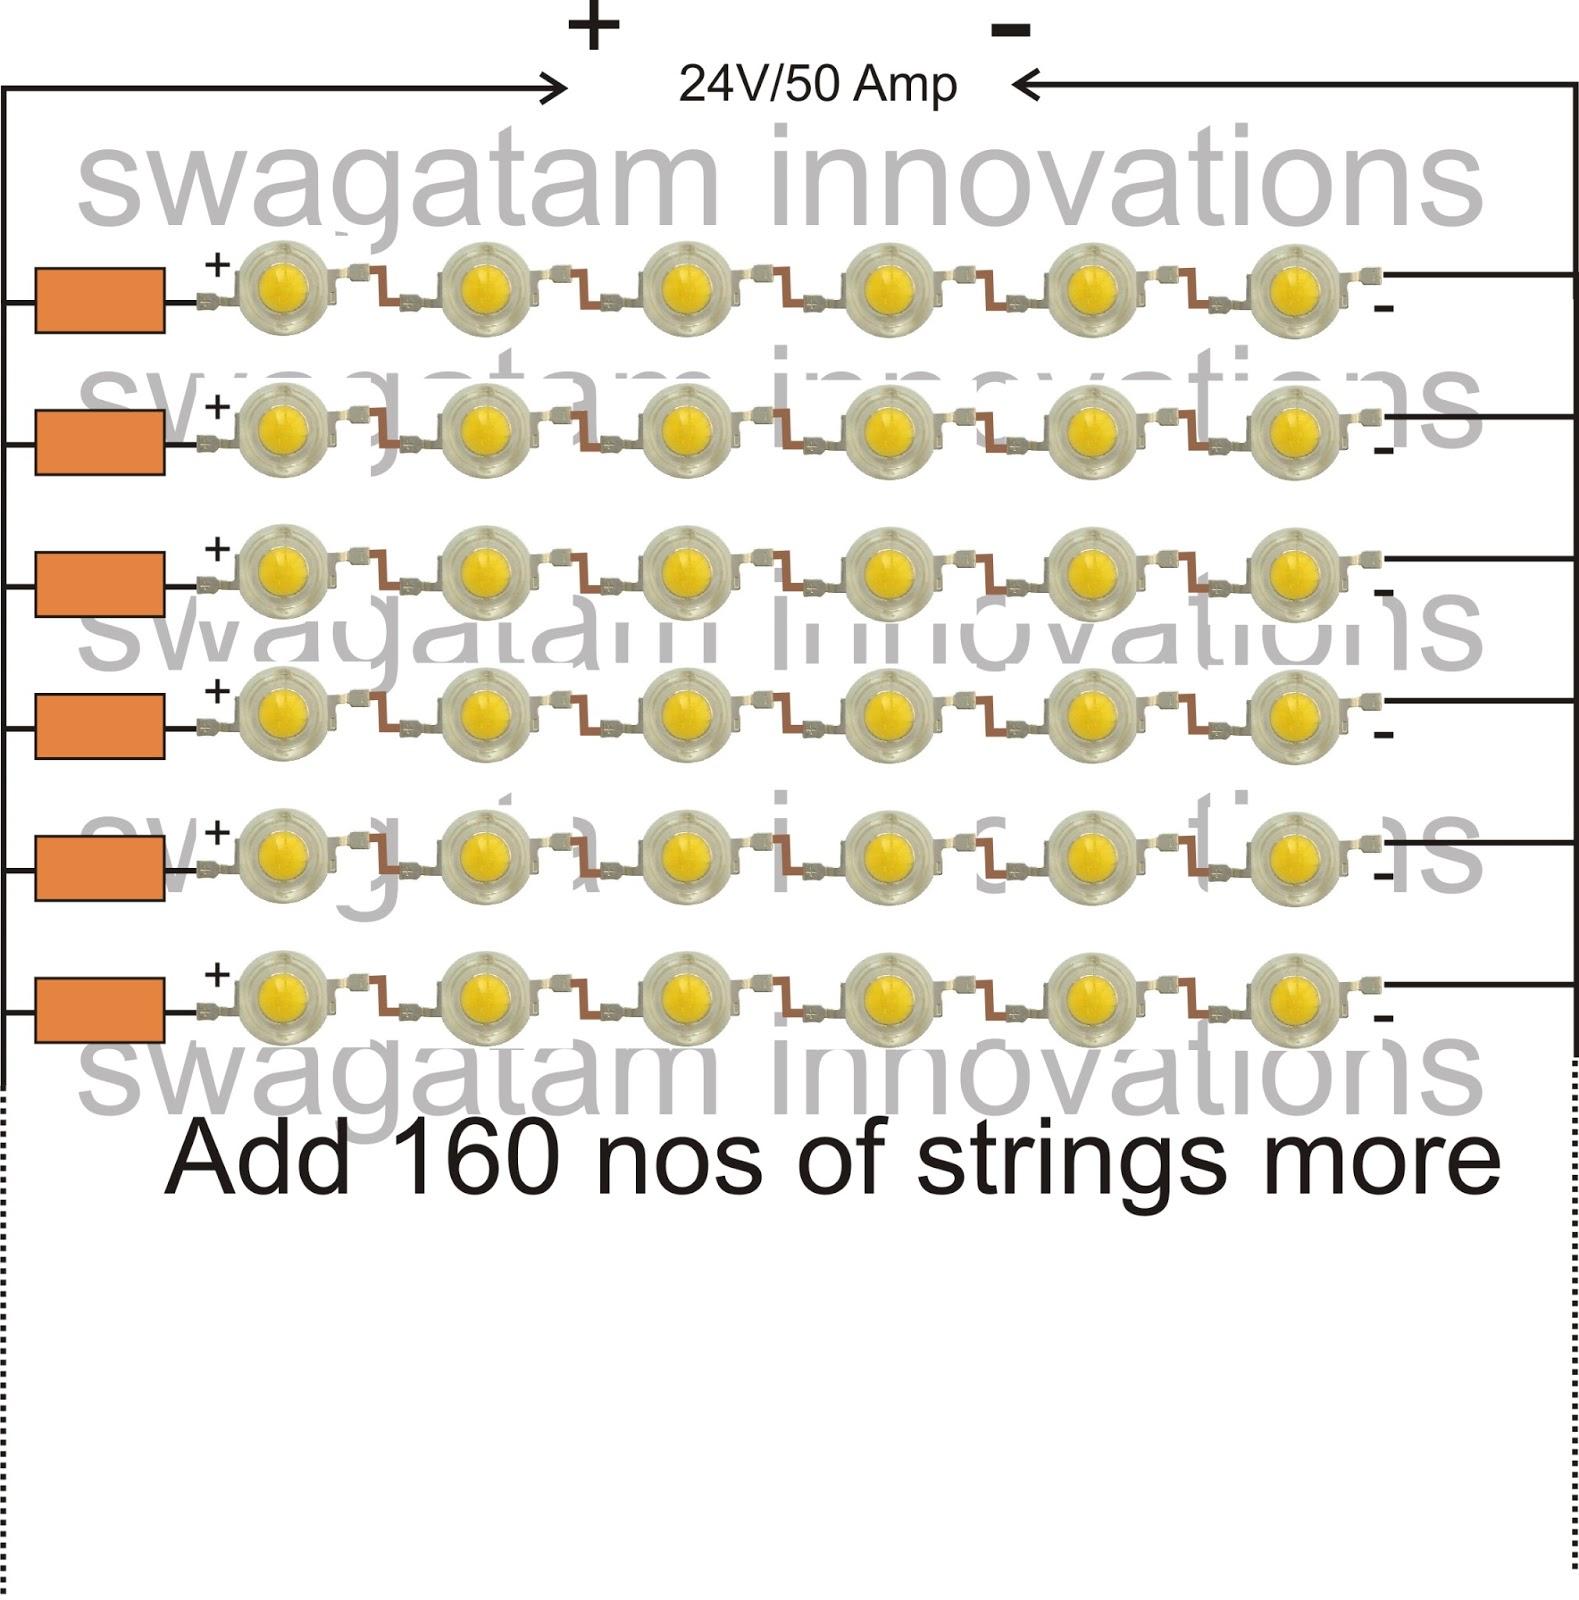 10 watt led driver circuit diagram aprilia rs 50 2008 wiring make this 1000 flood light electronic